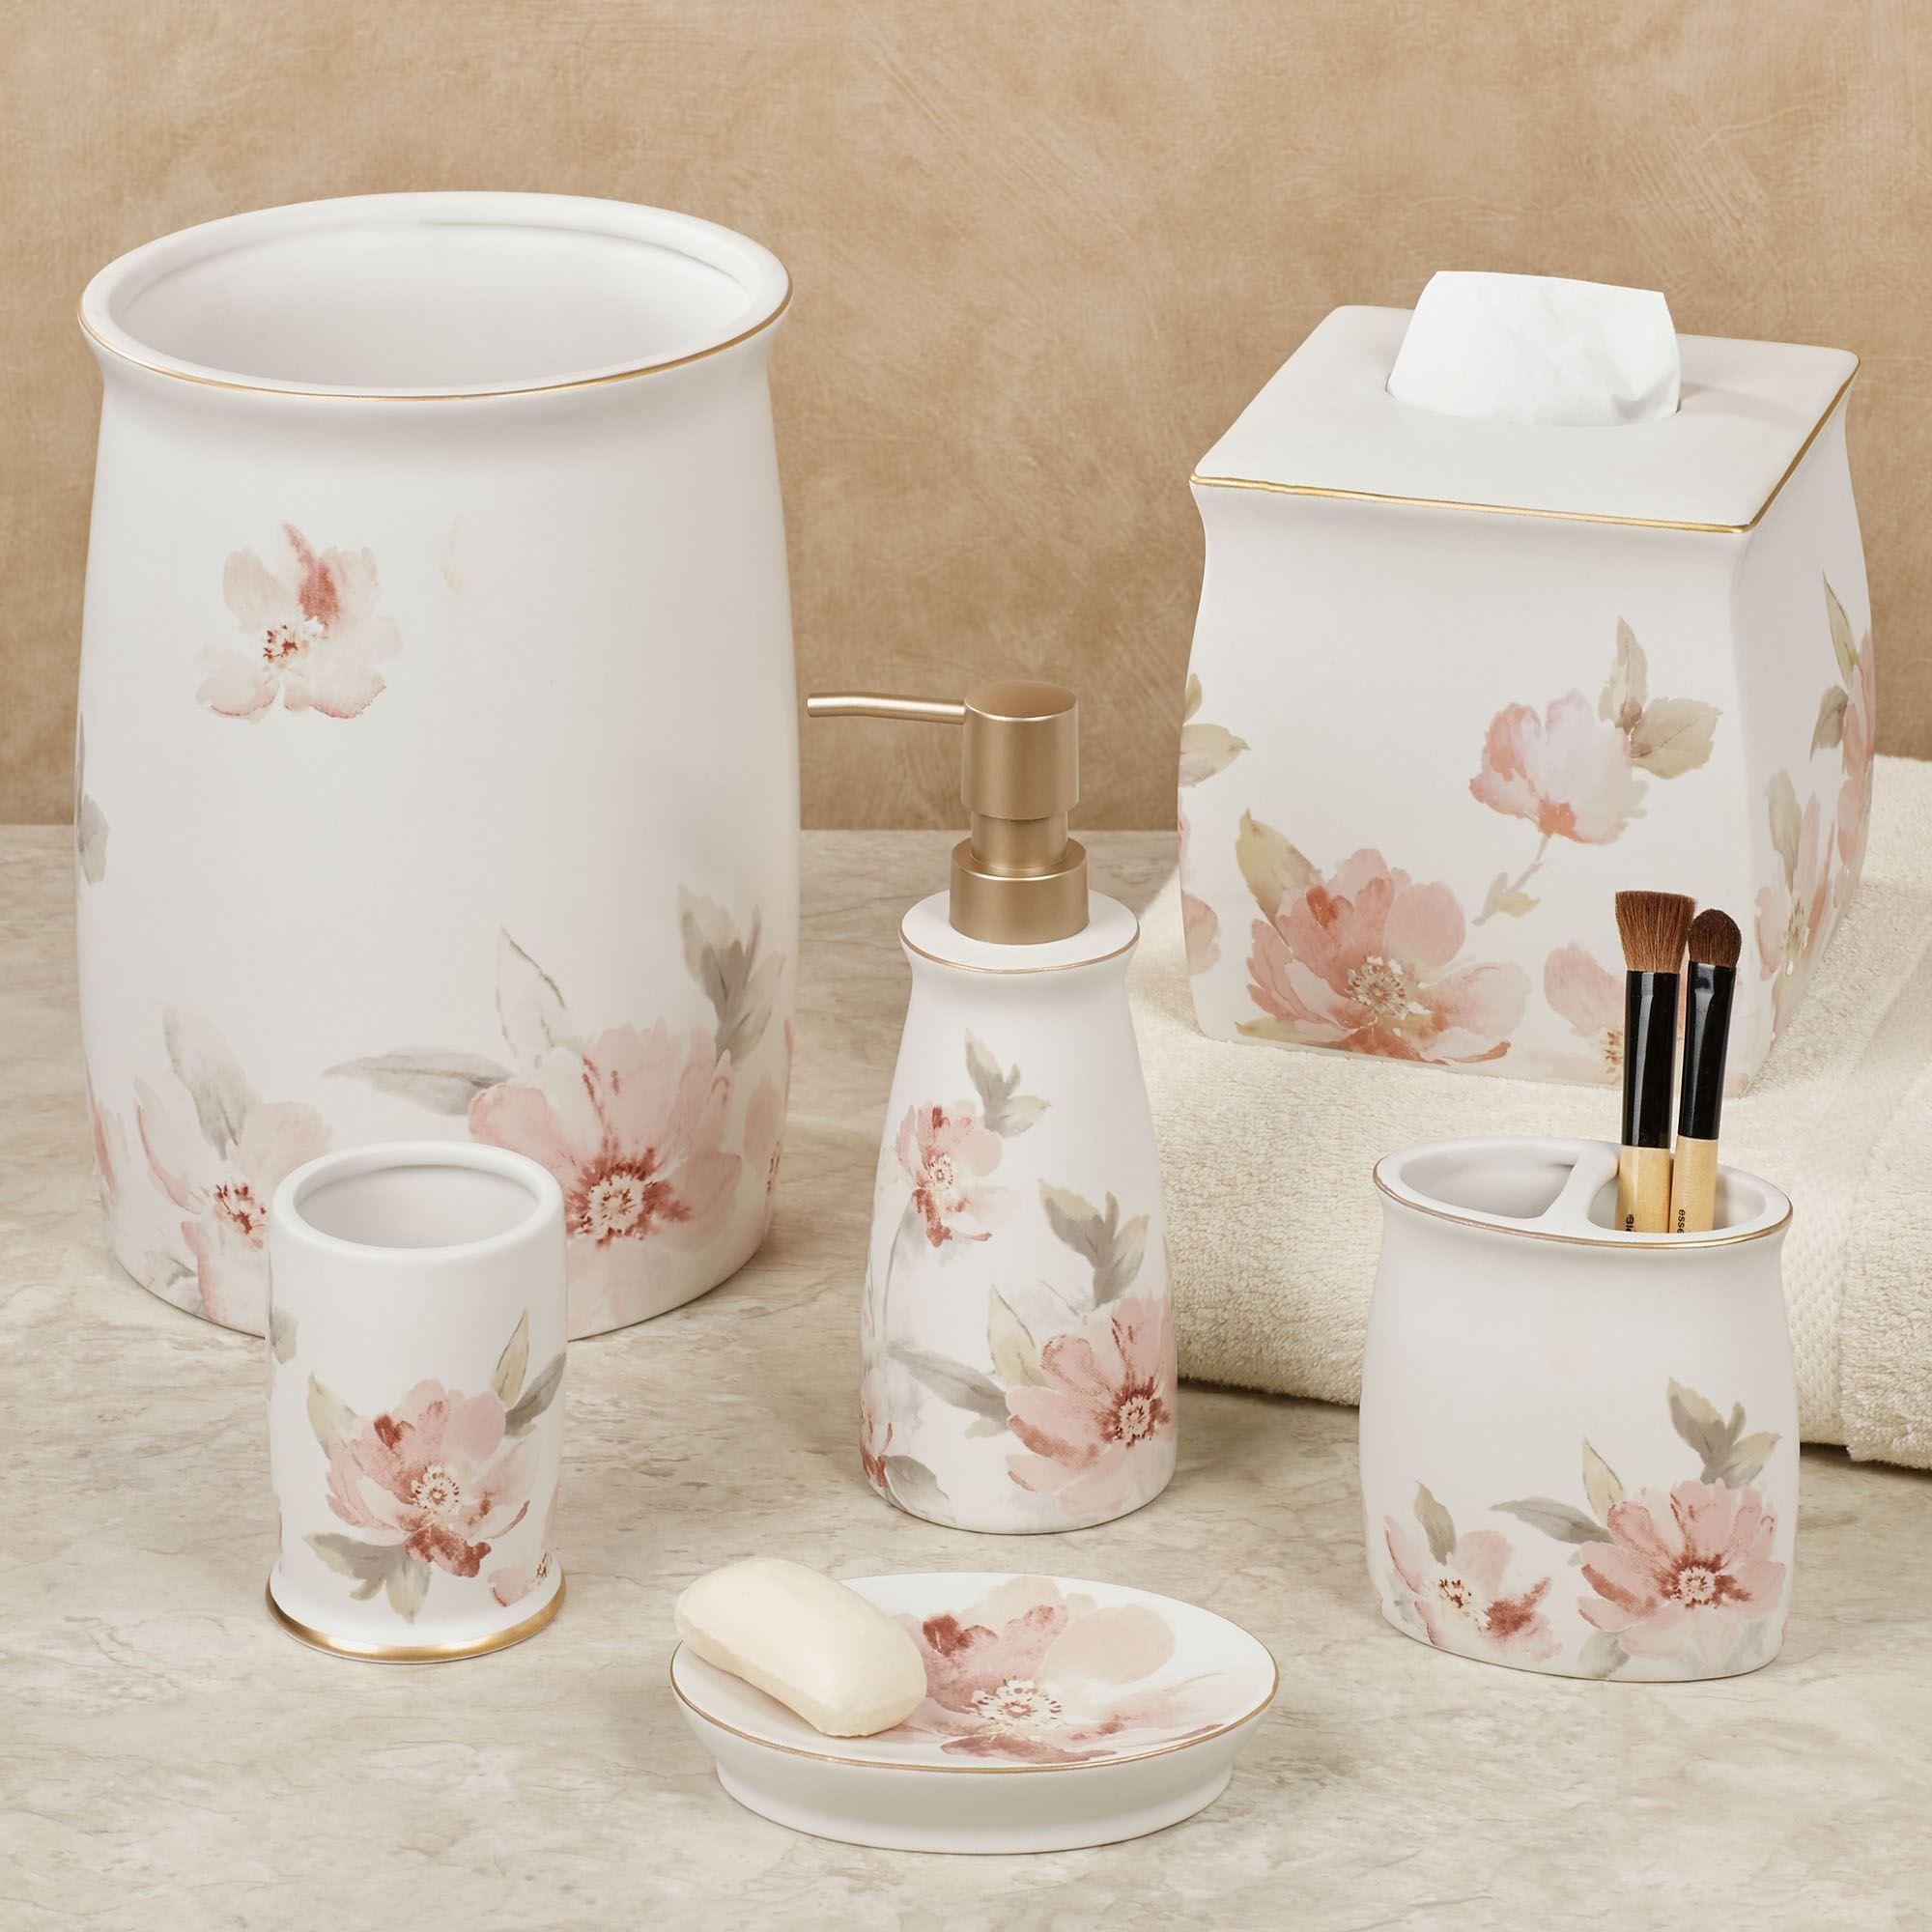 Misty Fl Ceramic Bath Accessories, Flower Bathroom Sets